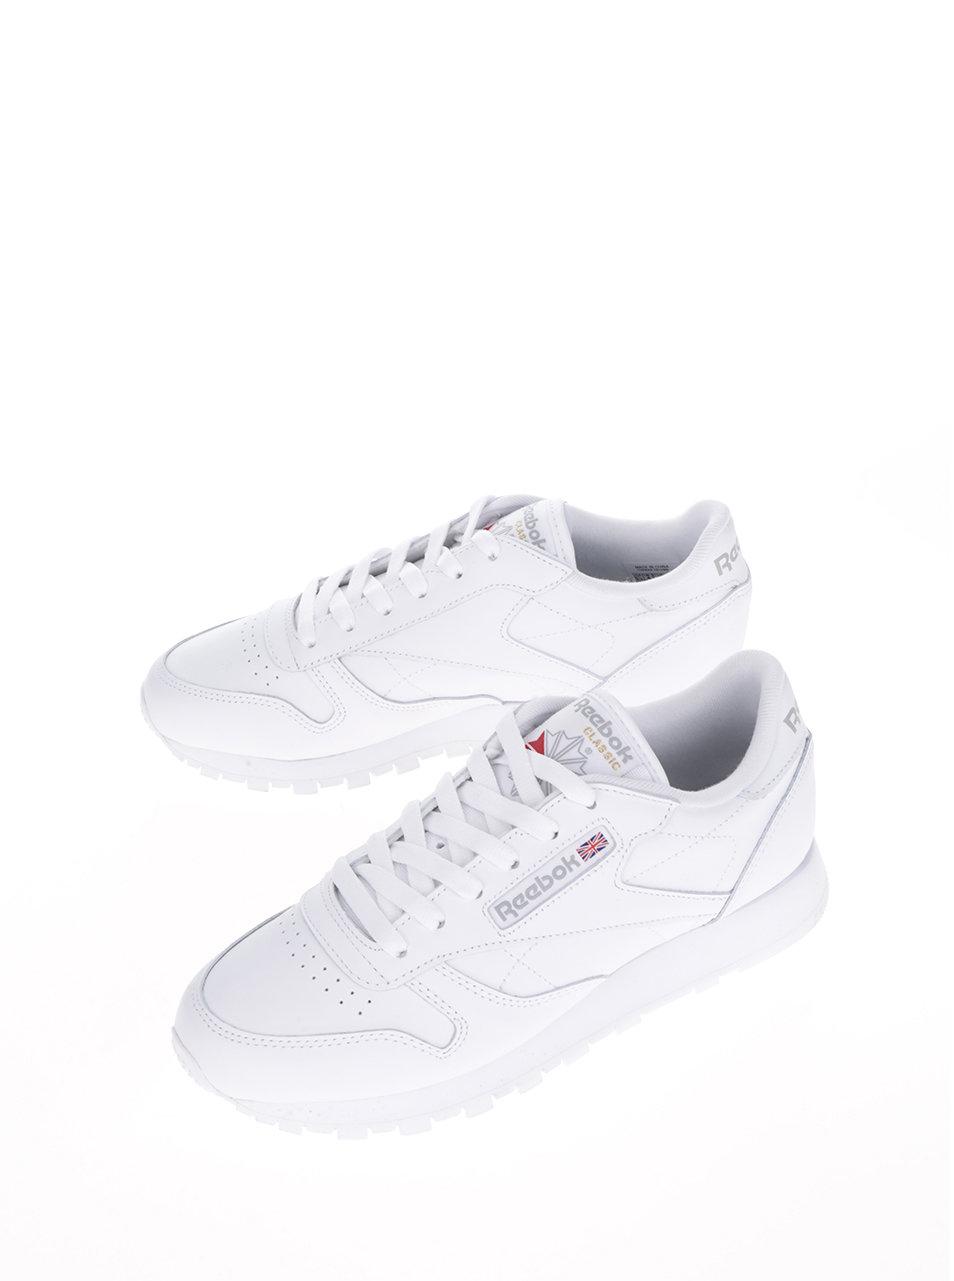 b034c66a44 Biele dámske kožené tenisky s tvarovanou podrážkou Reebok Classic ...